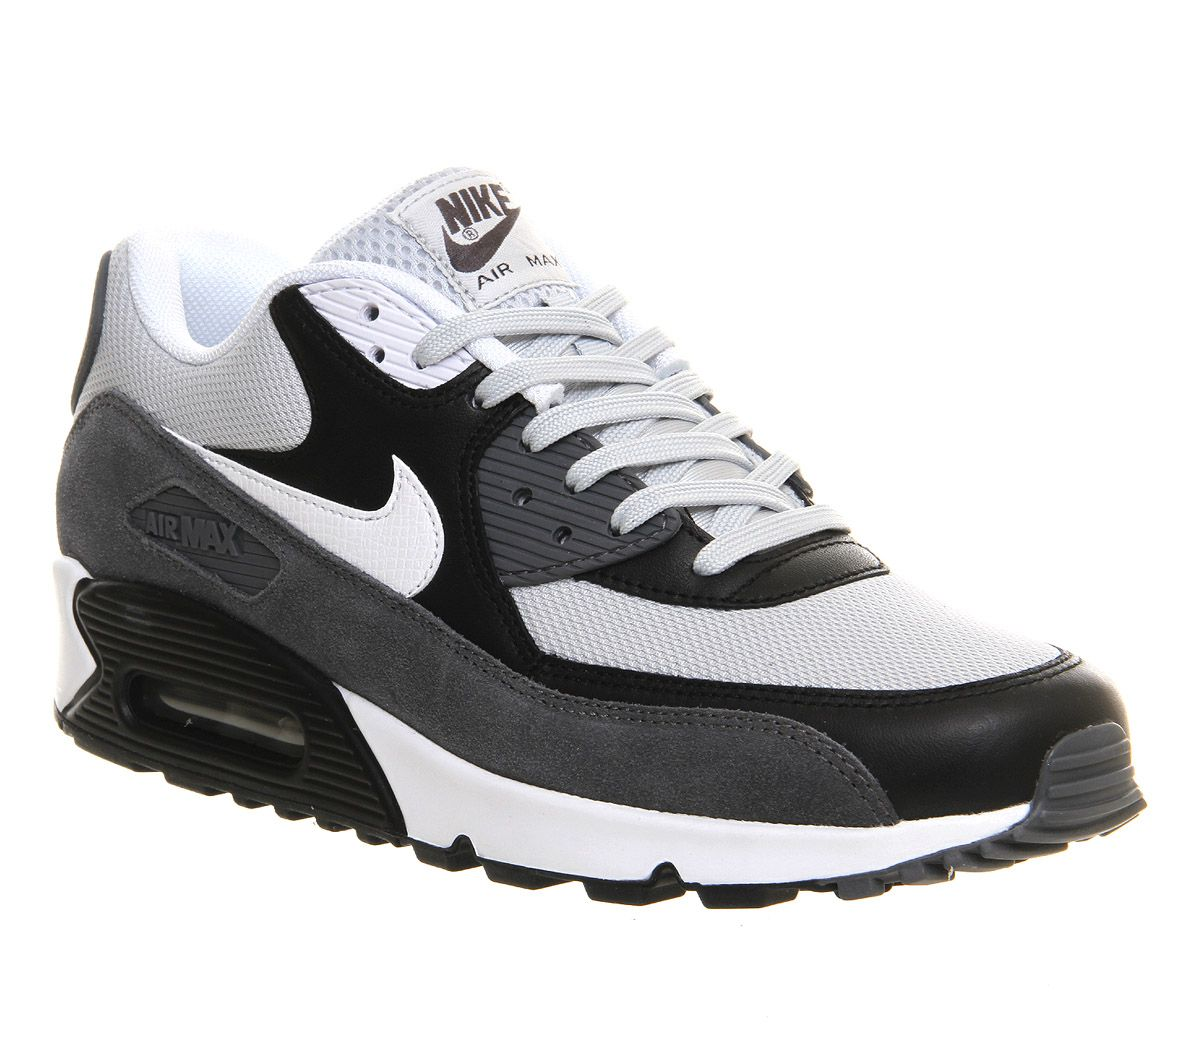 effd59833ad2 Custom Nike Roshe Run Paisley by customsxcario on Etsy